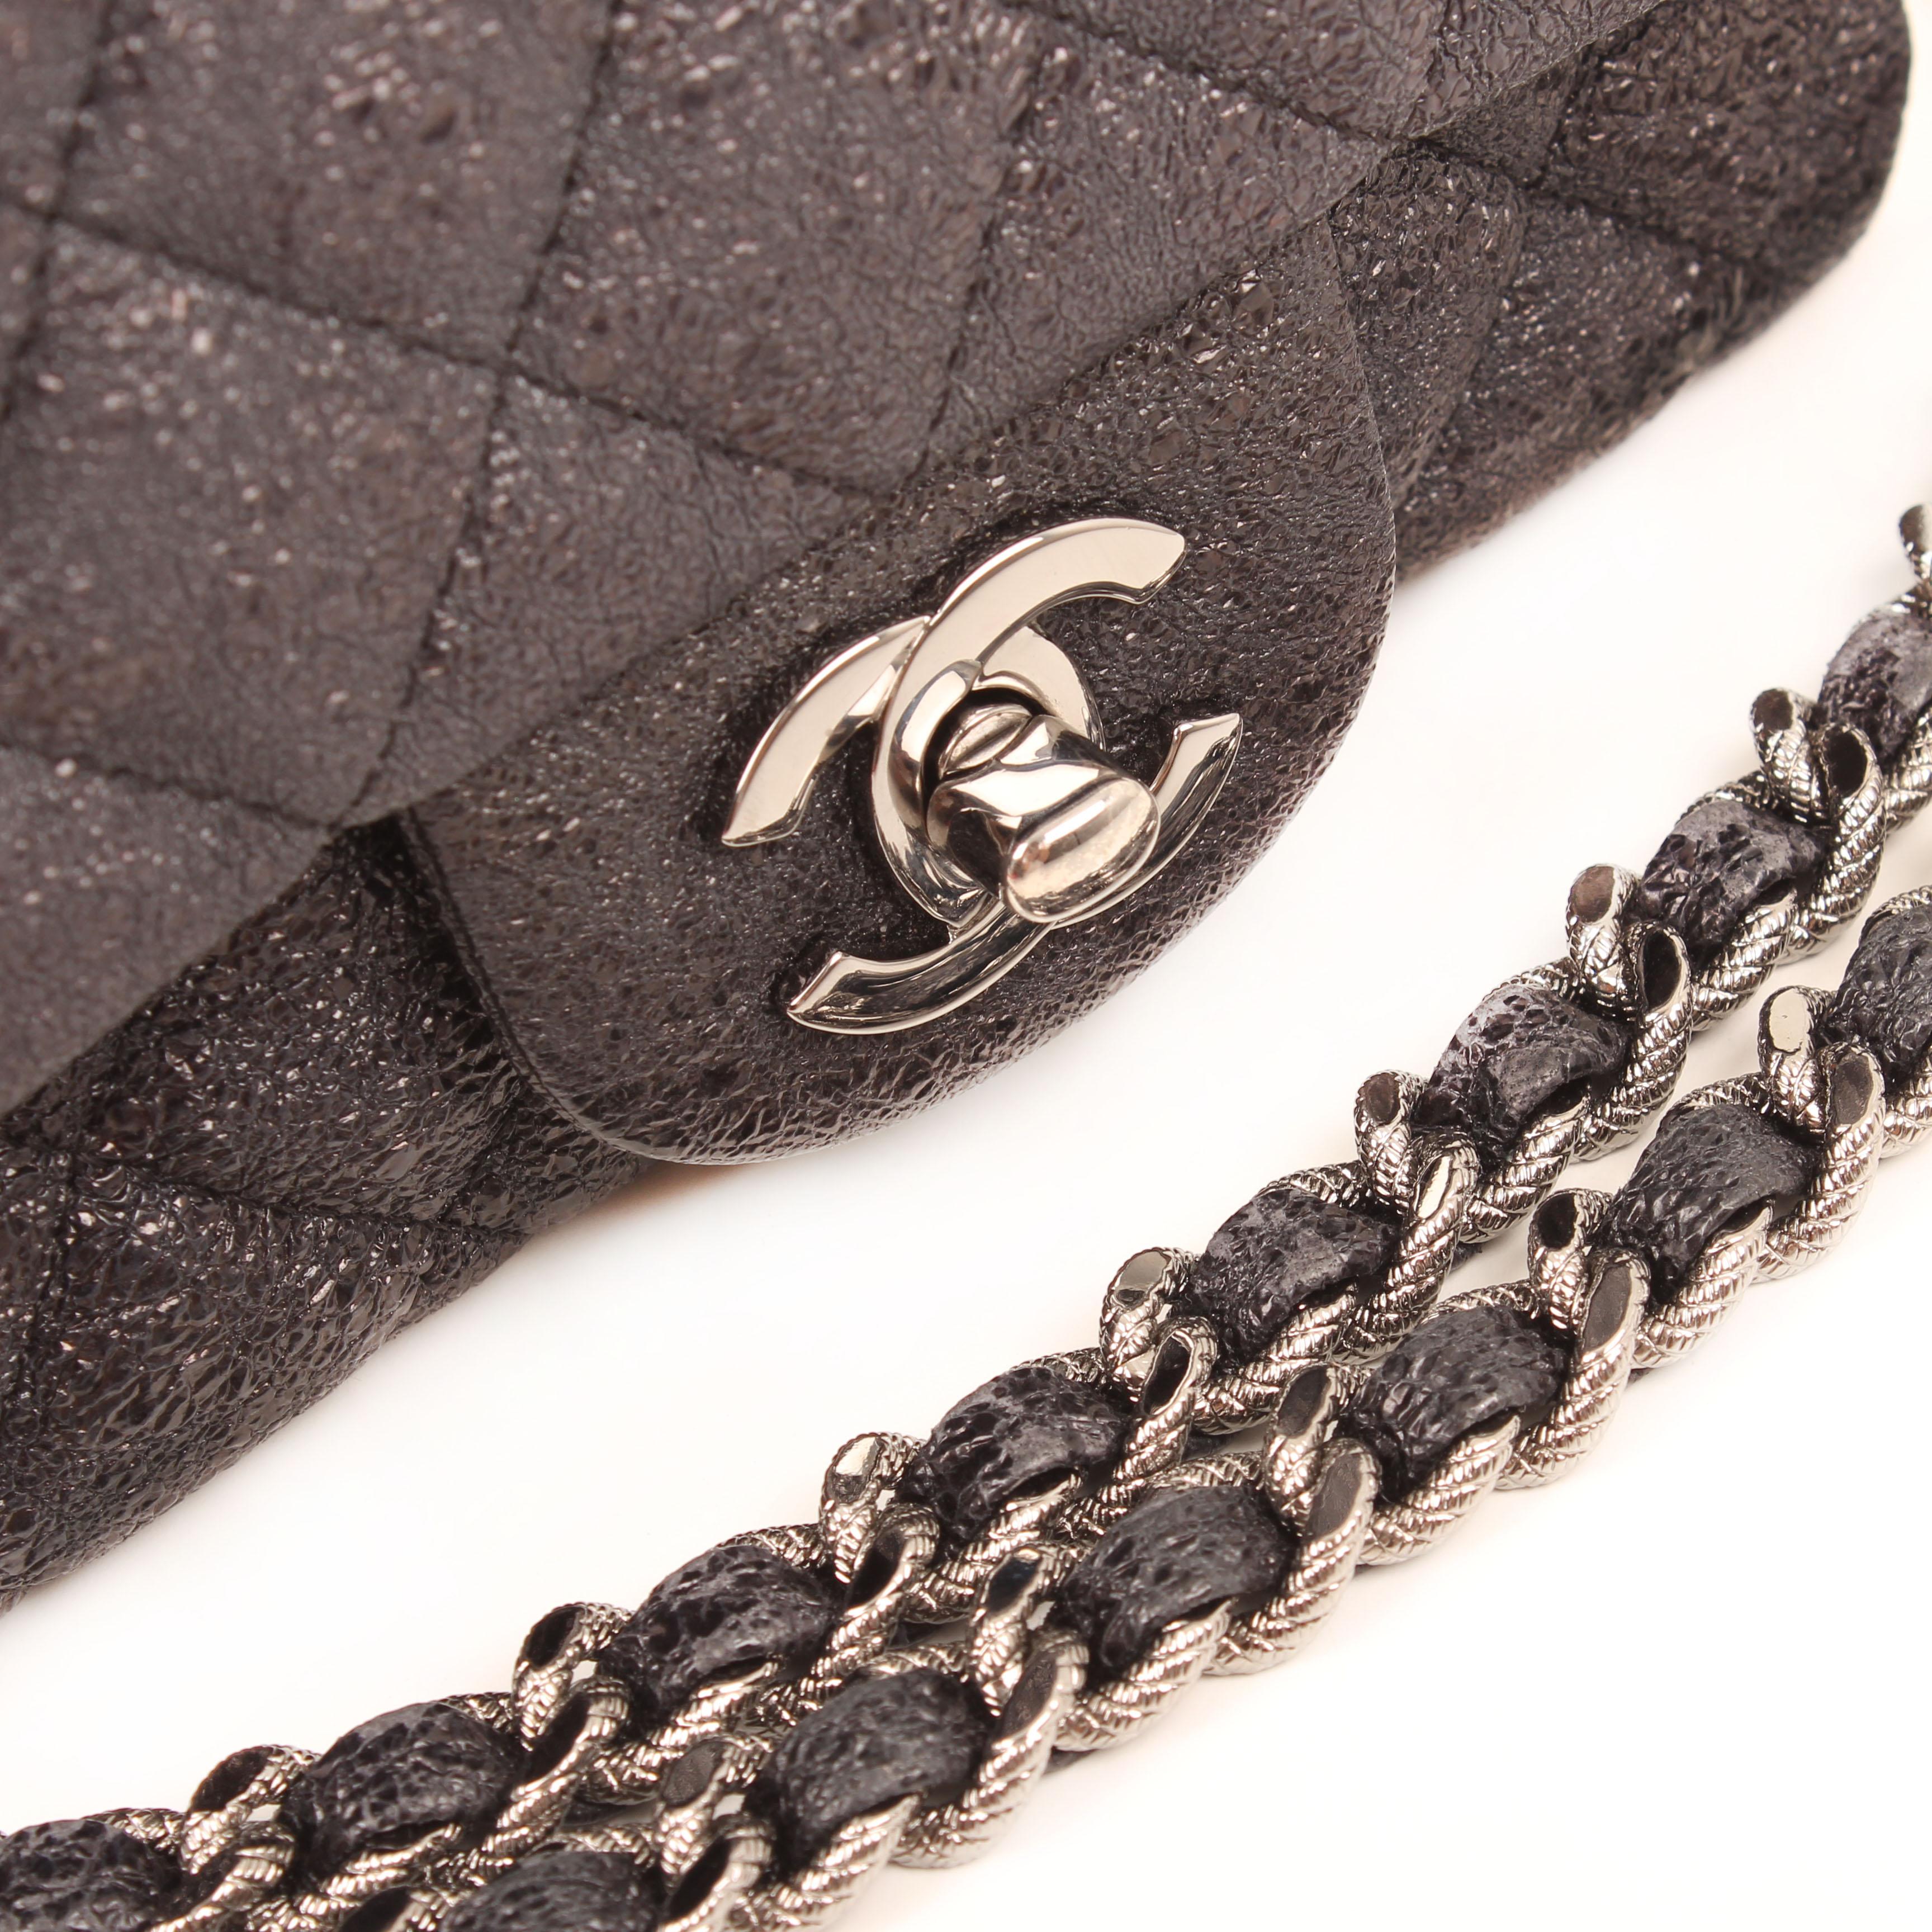 bolso cruzado chanel mini crackled calfskin gris cierre cadena